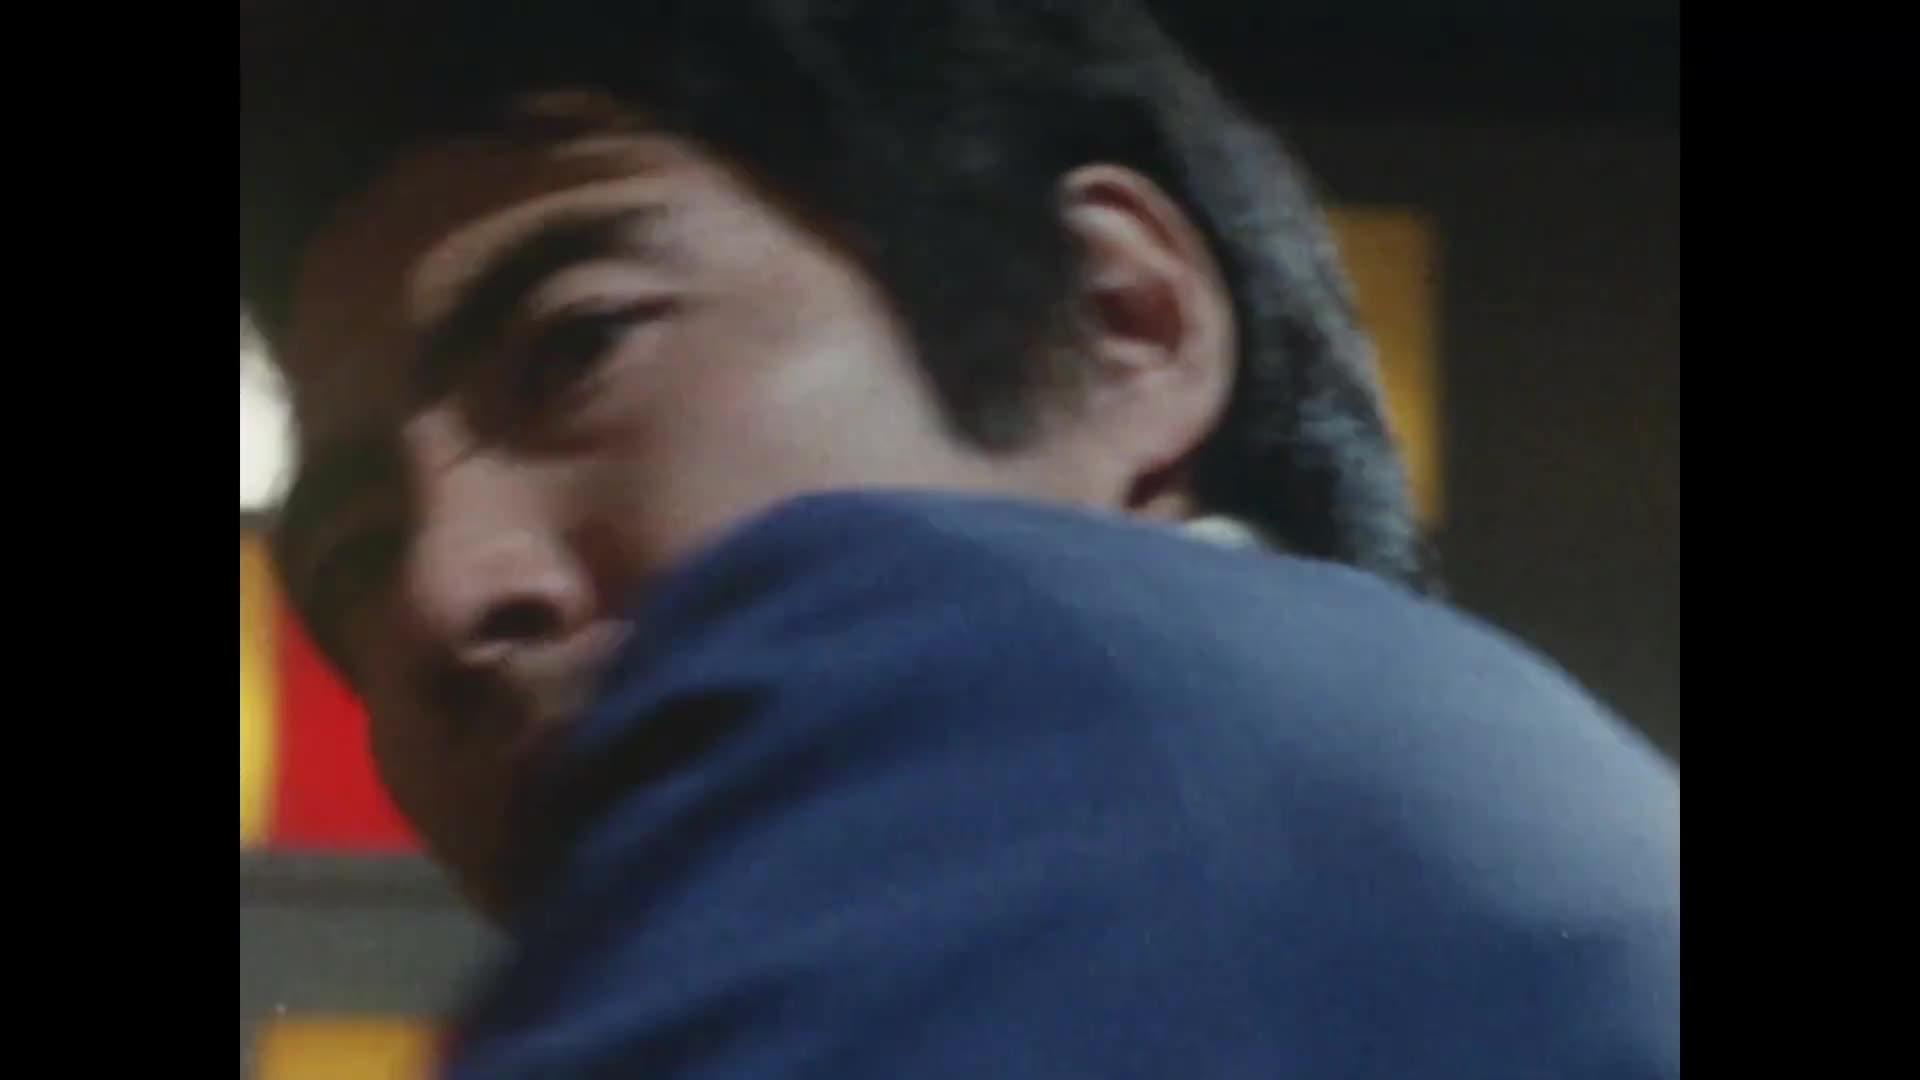 Mirrorman (1971)